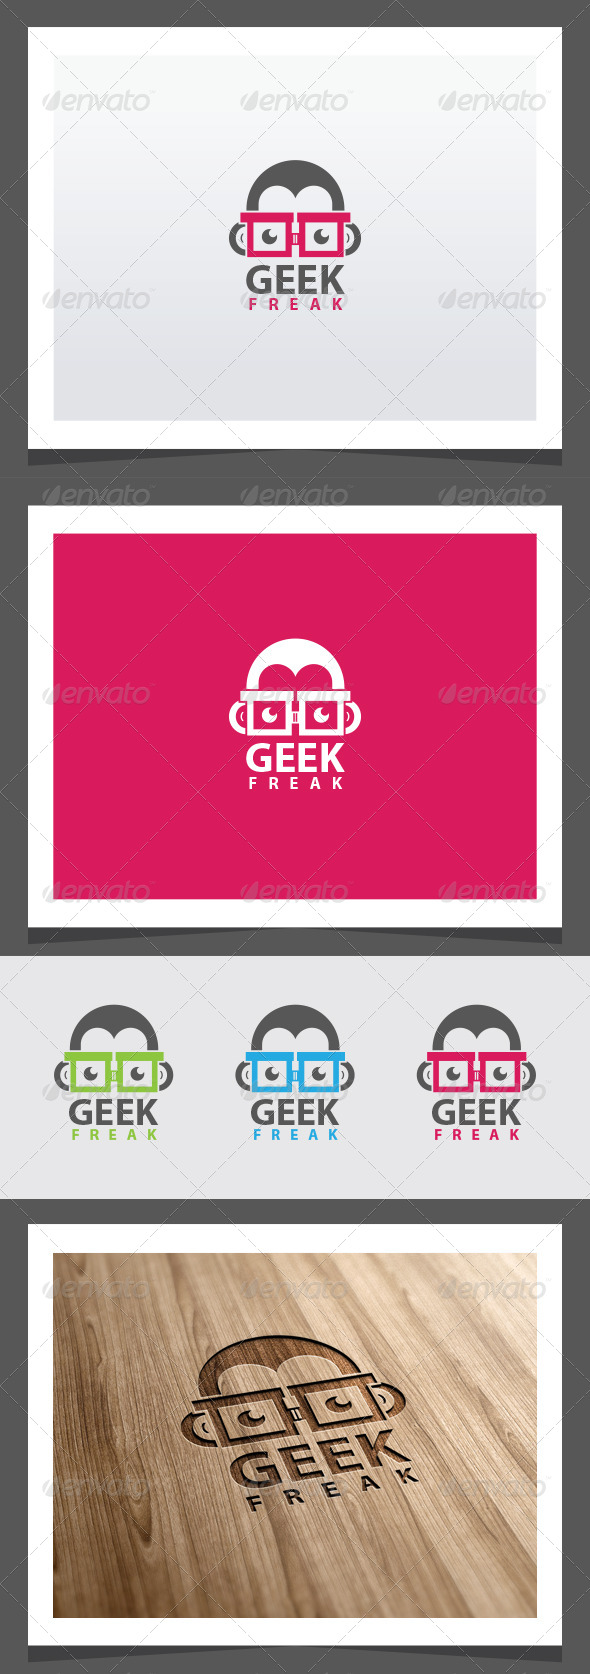 Geek Freak Logo Template